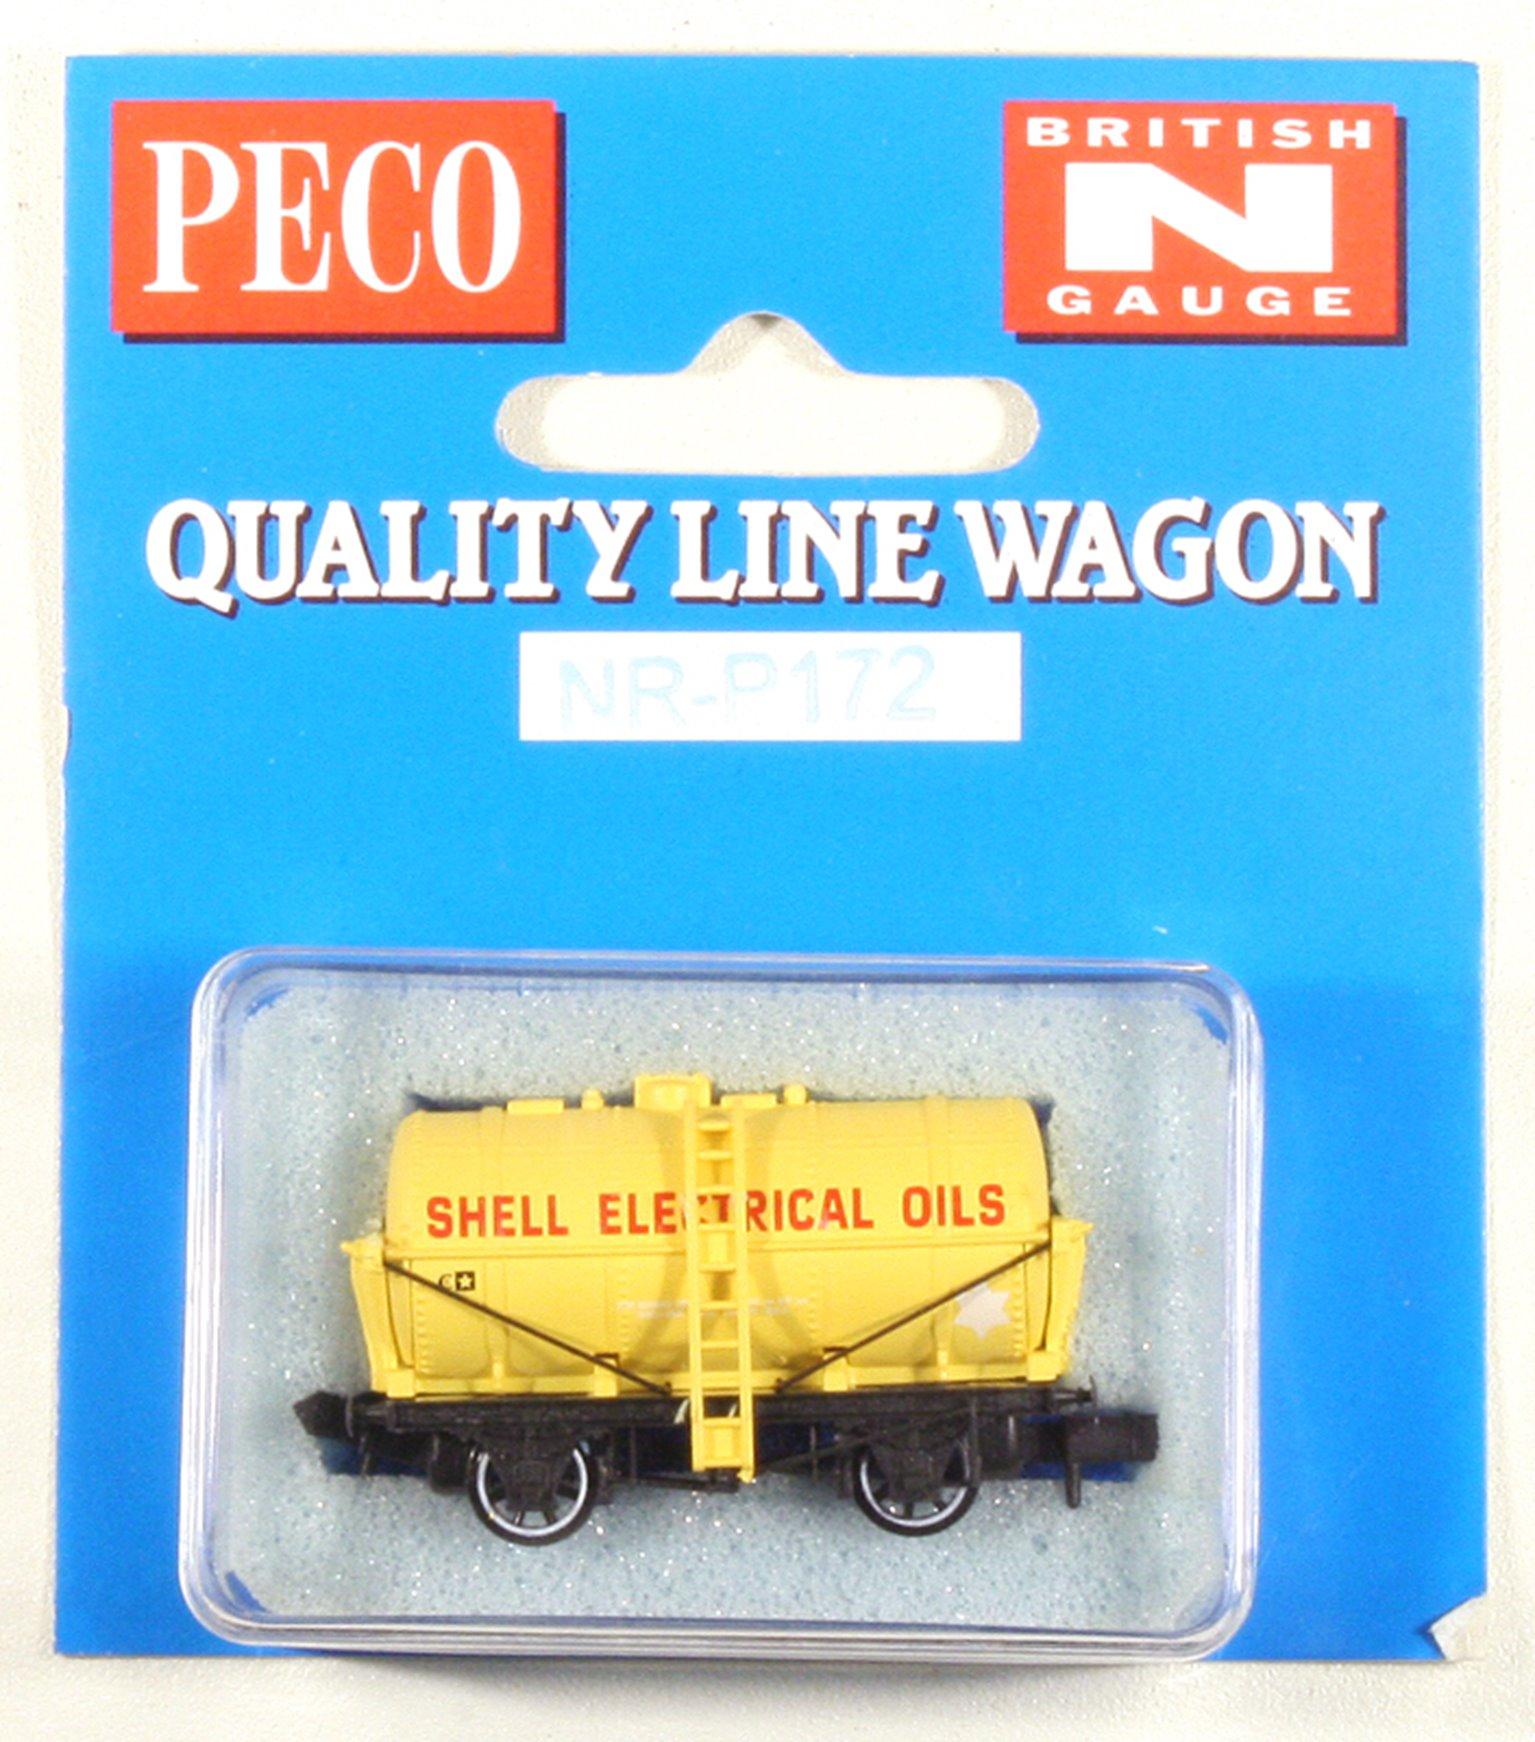 Shell Electric Oils Tank Wagon - Yellow